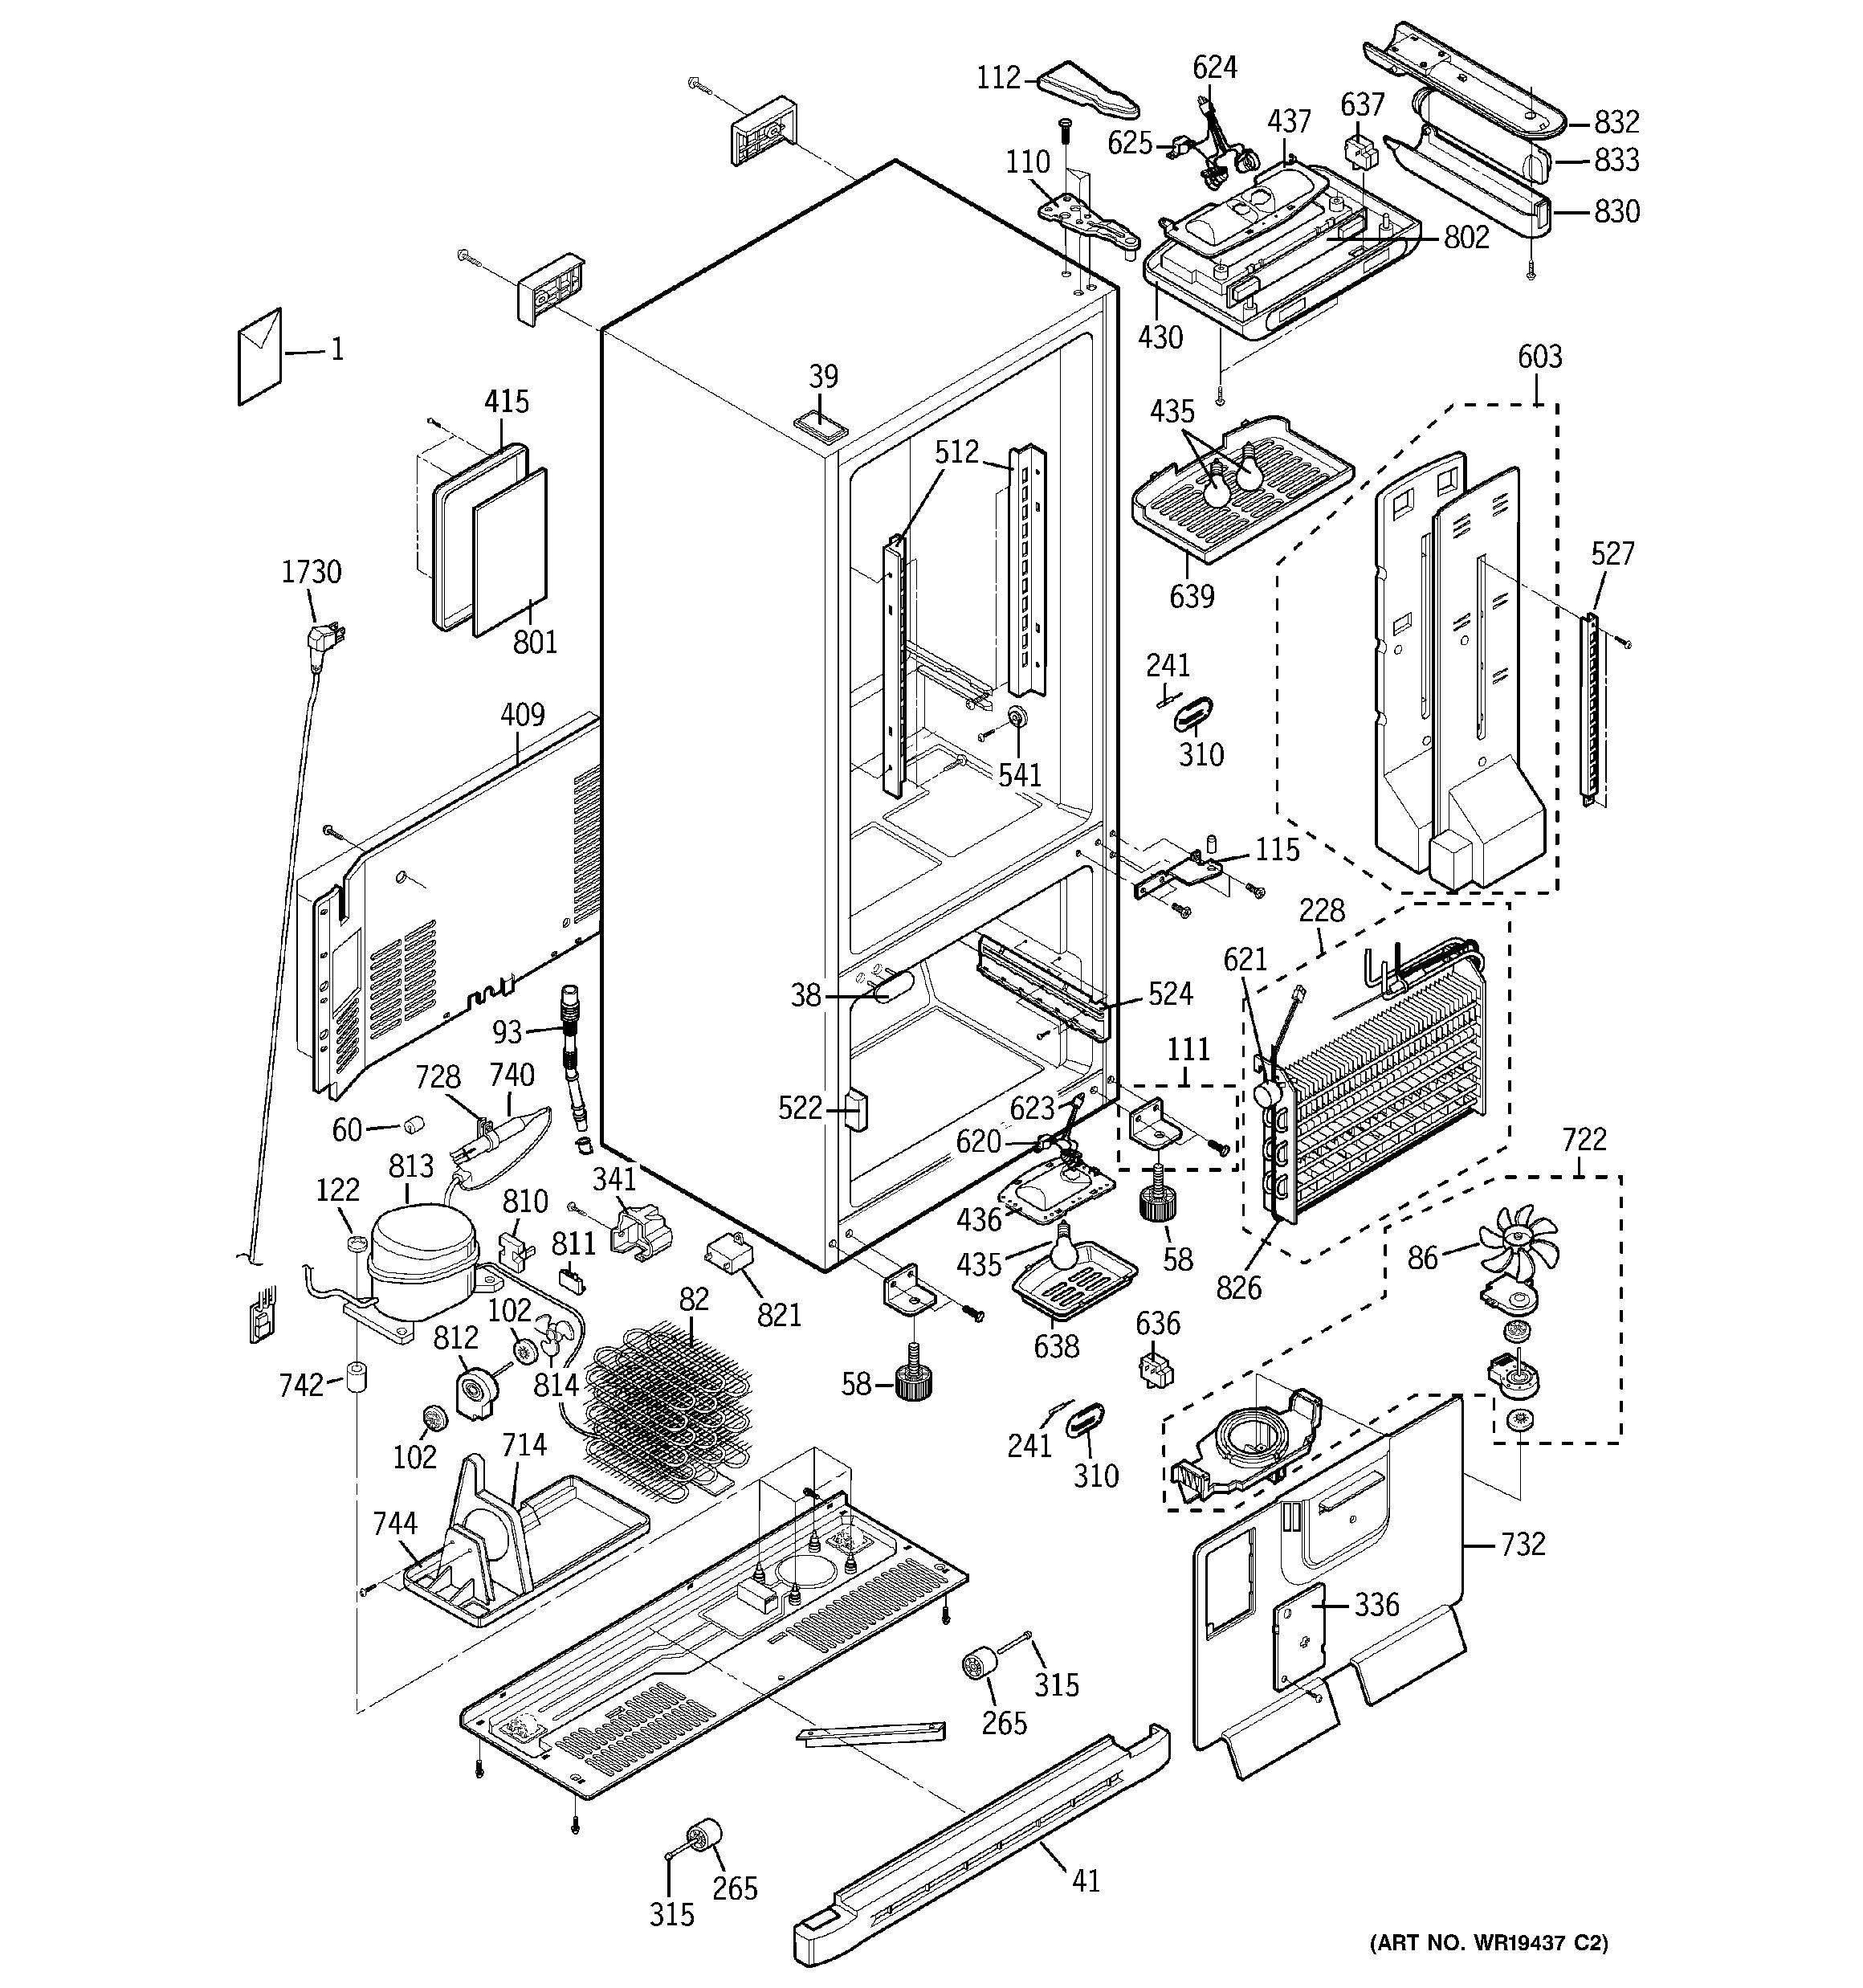 FD_0061] Refrigerator Parts Ge Refrigerator Parts Diagrams Schematic Wiring | Ge Refrigerator Schematic Electrical |  | Cette Funa Hete Weasi Hete Inama Mohammedshrine Librar Wiring 101